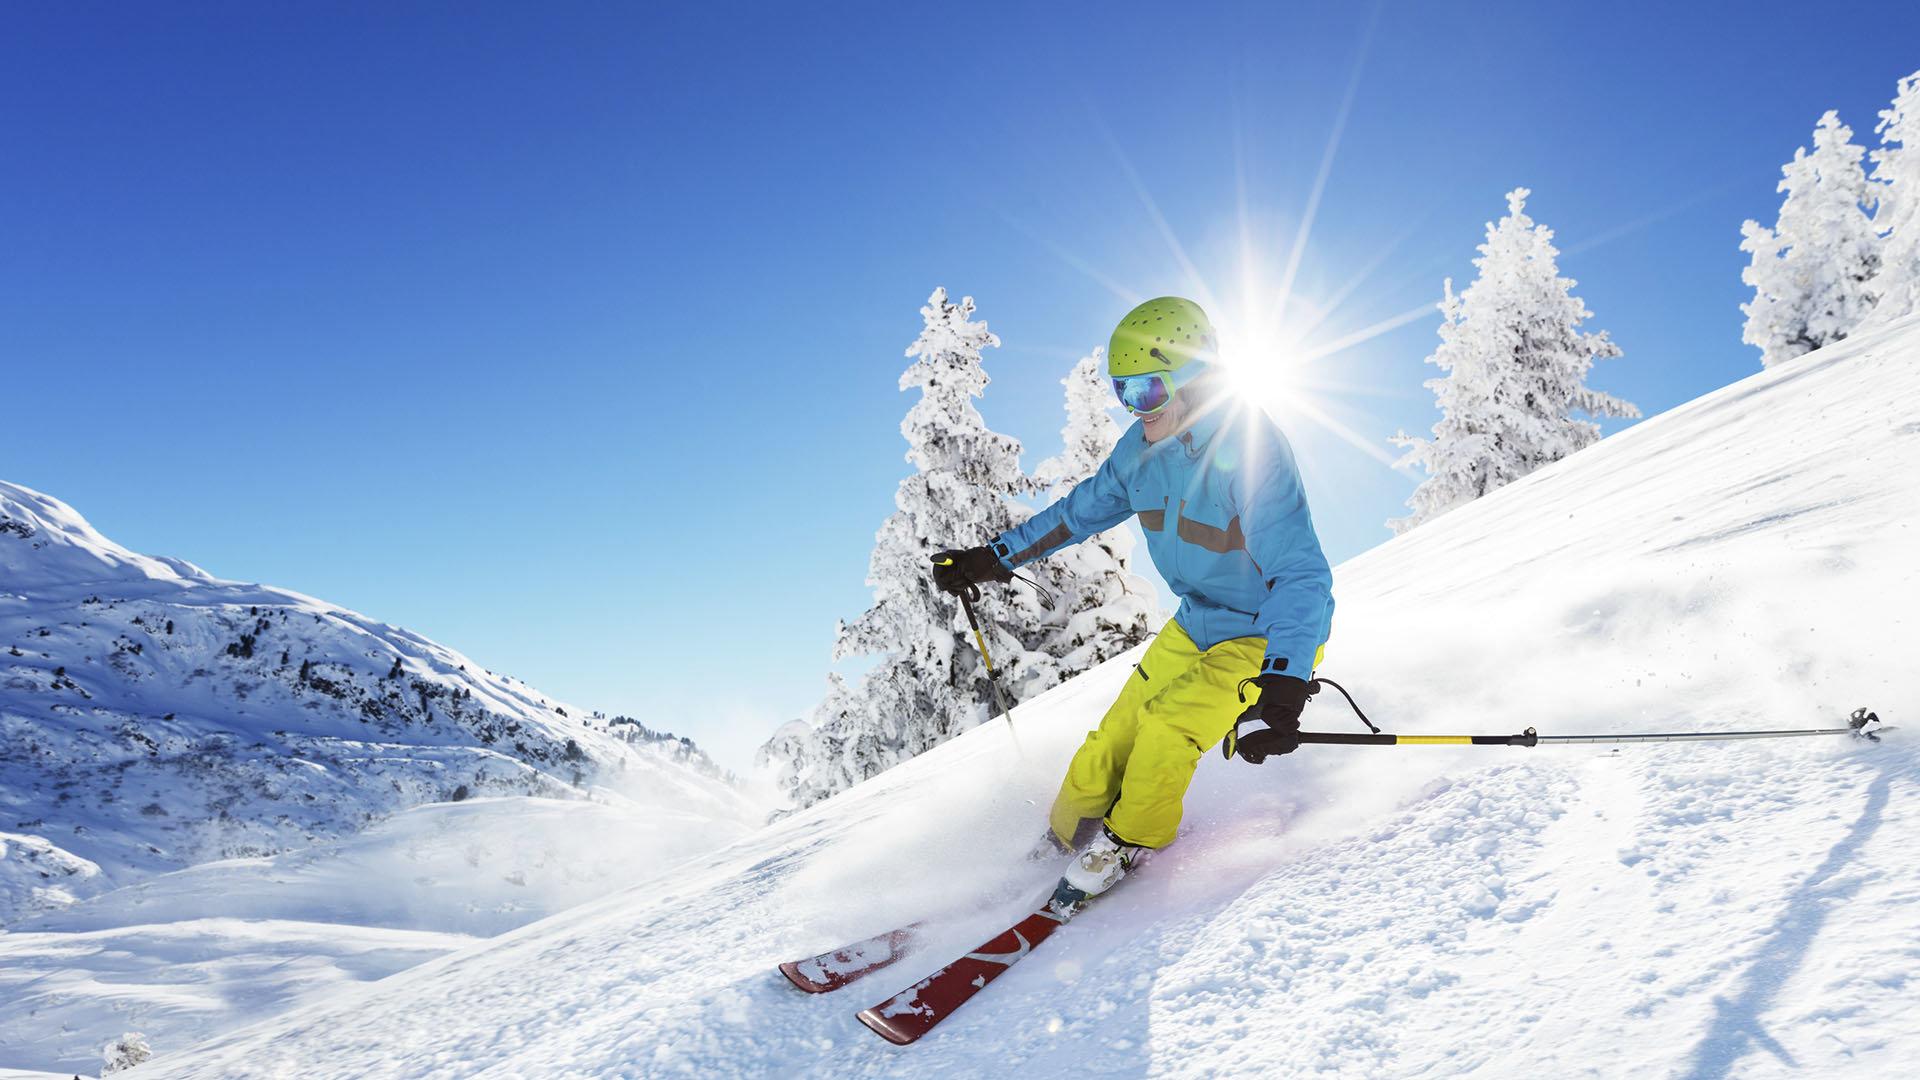 Skiing Sport Wallpaper Iphone: Skiing Wallpapers 1920x1080 Full HD (1080p) Desktop